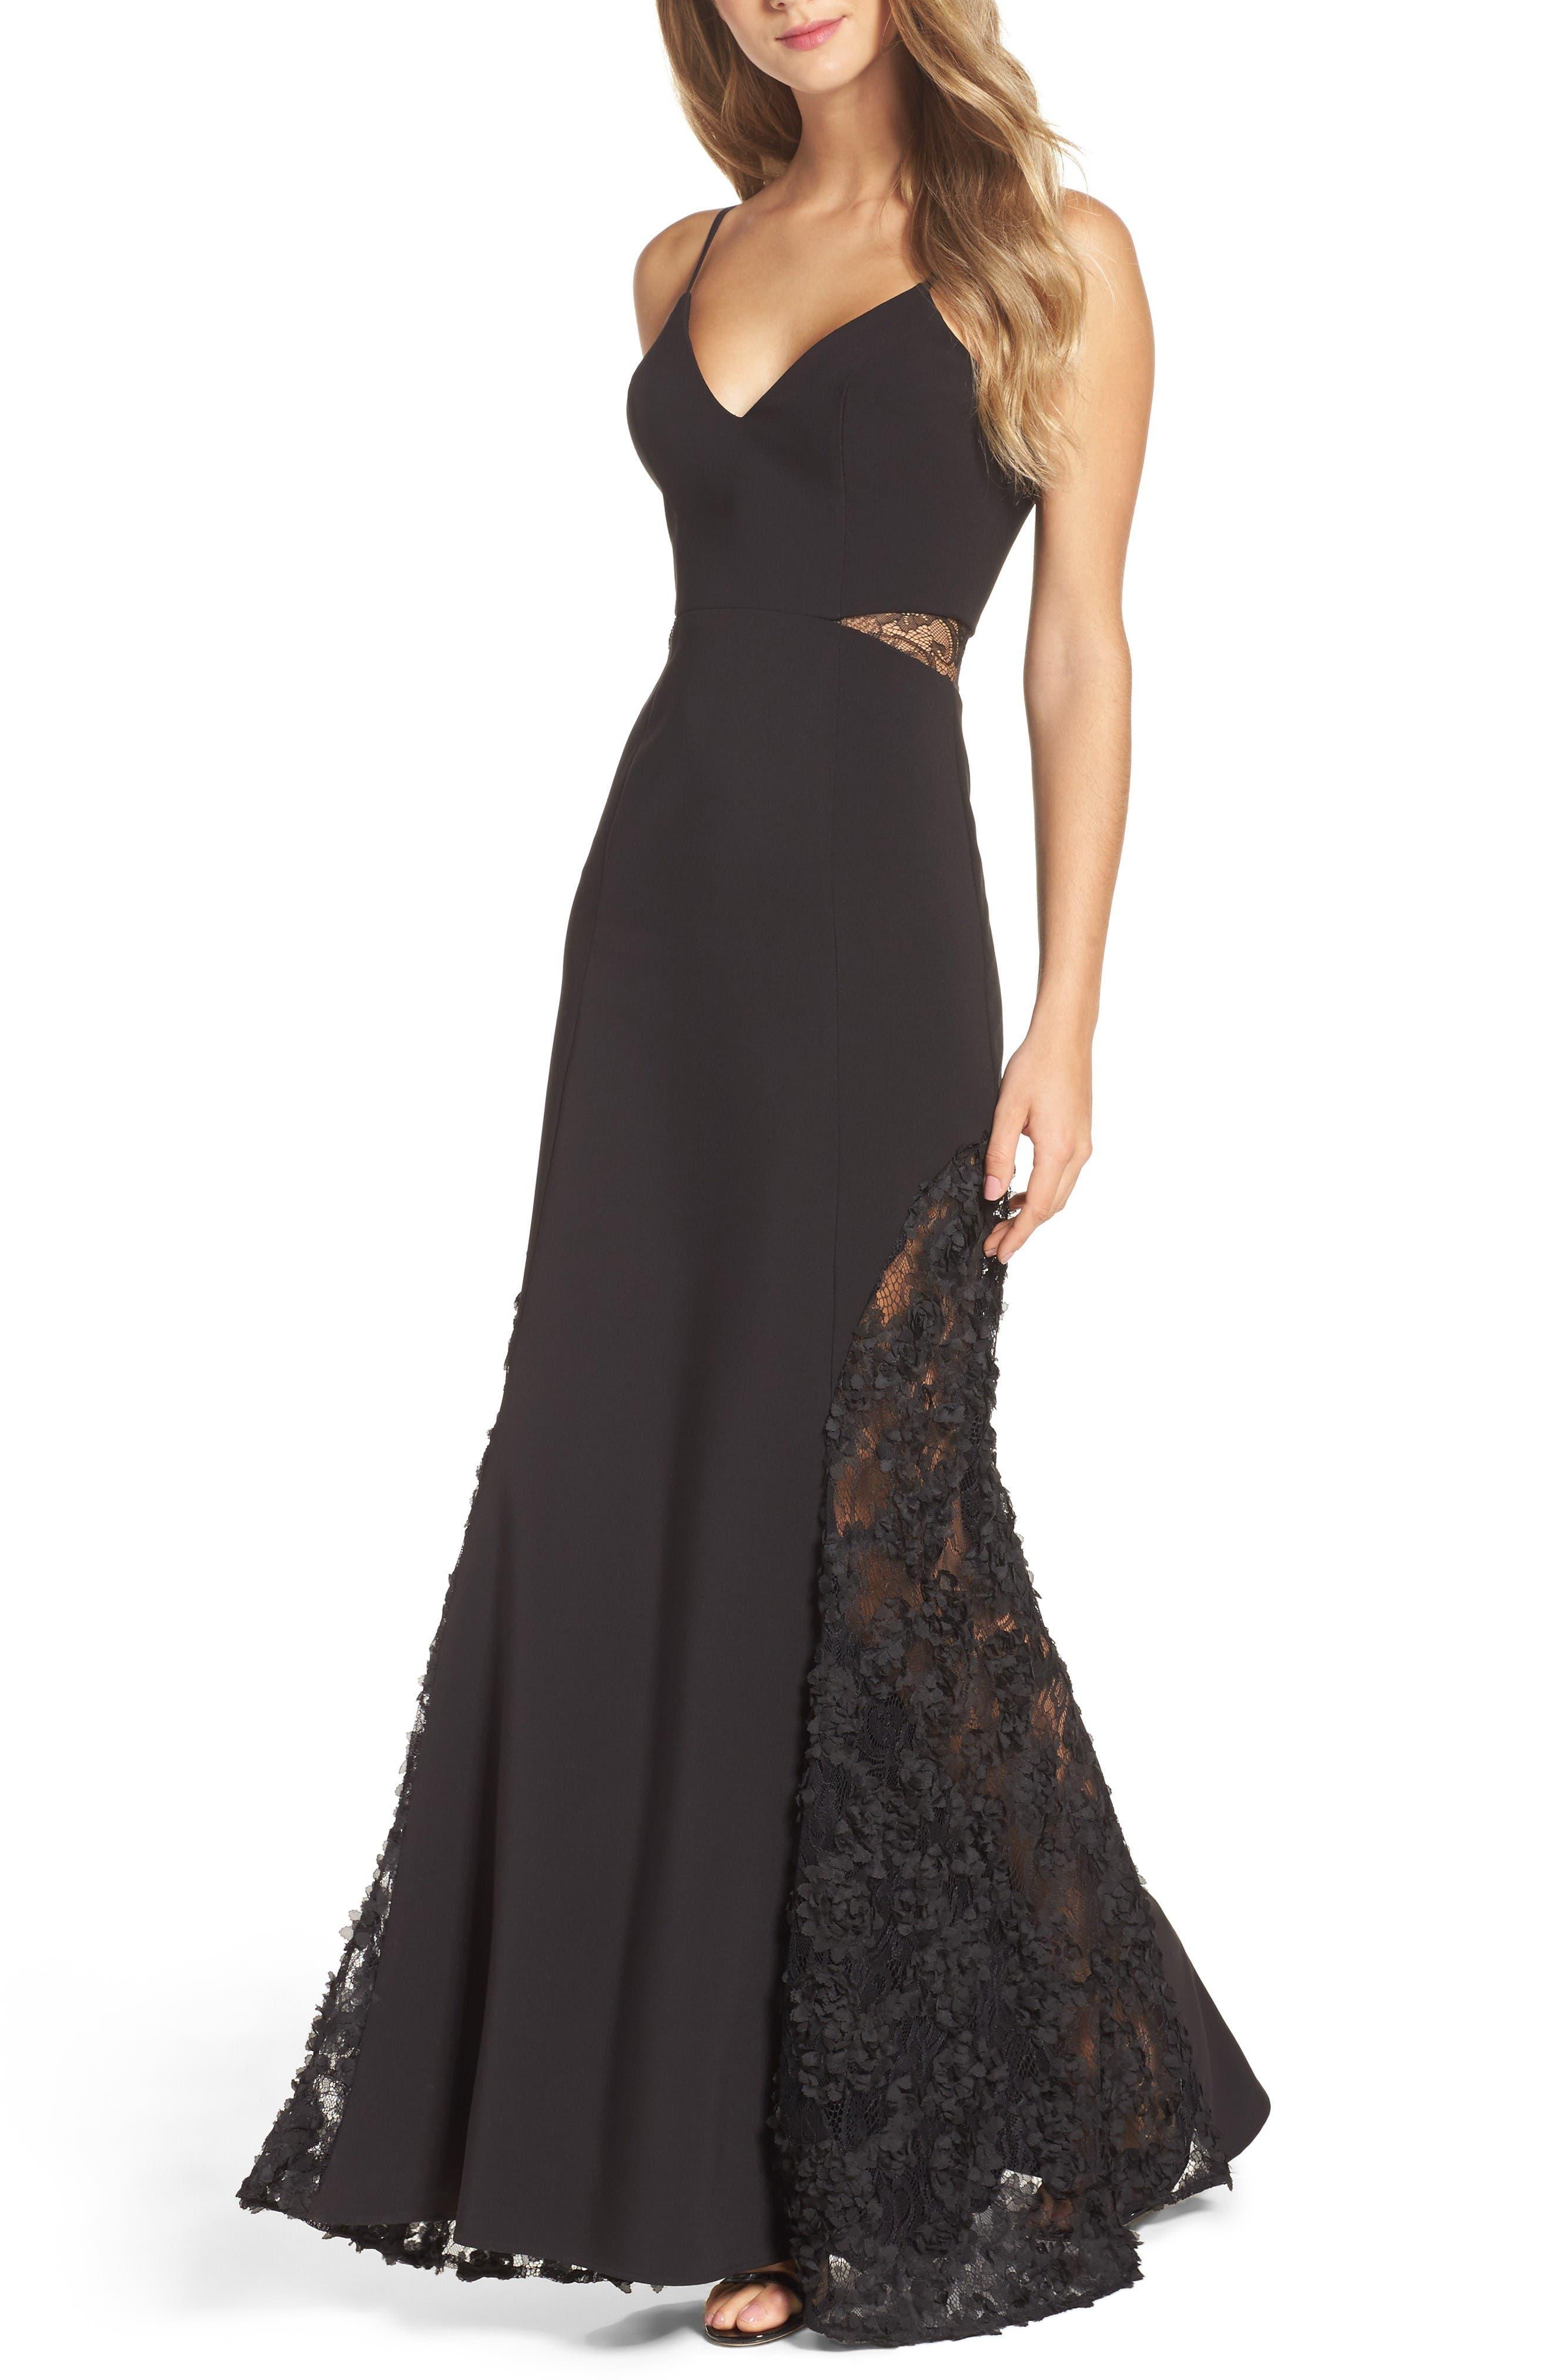 Shannon Lace Inset Gown,                             Alternate thumbnail 4, color,                             Black